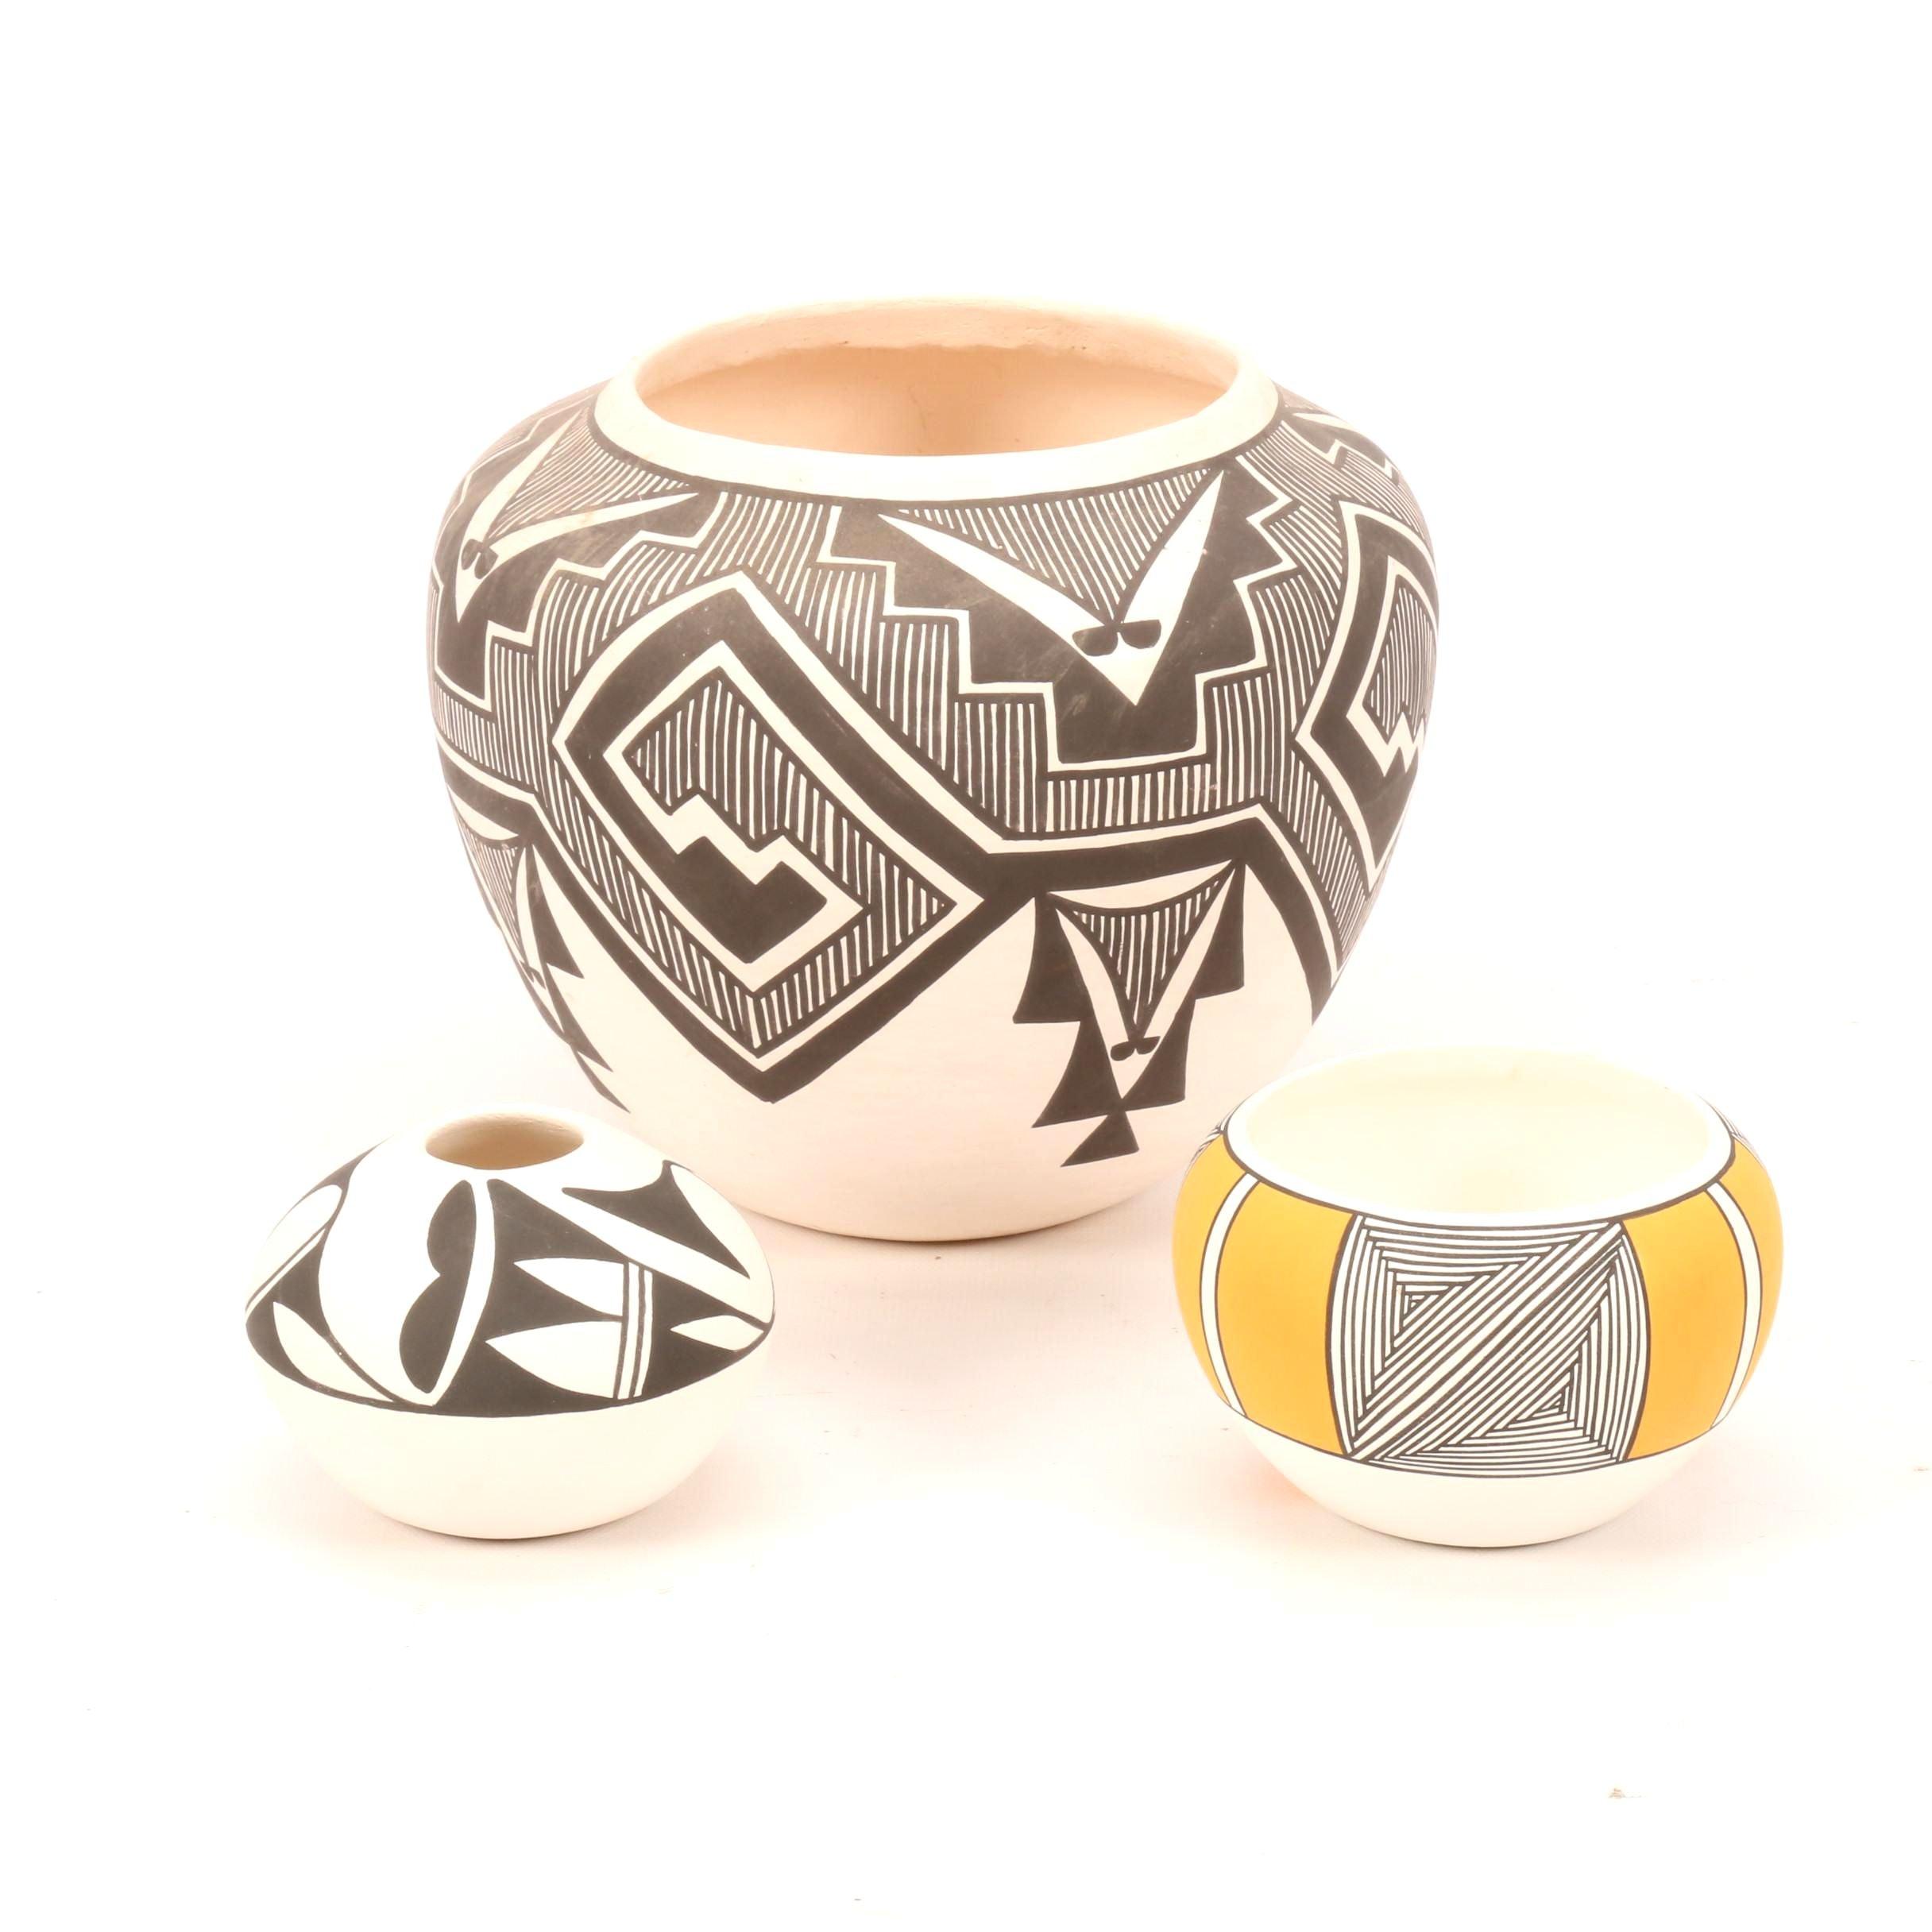 Acoma Pueblo Polychrome Earthenware Vases Including Vallo, Abieta and Chino